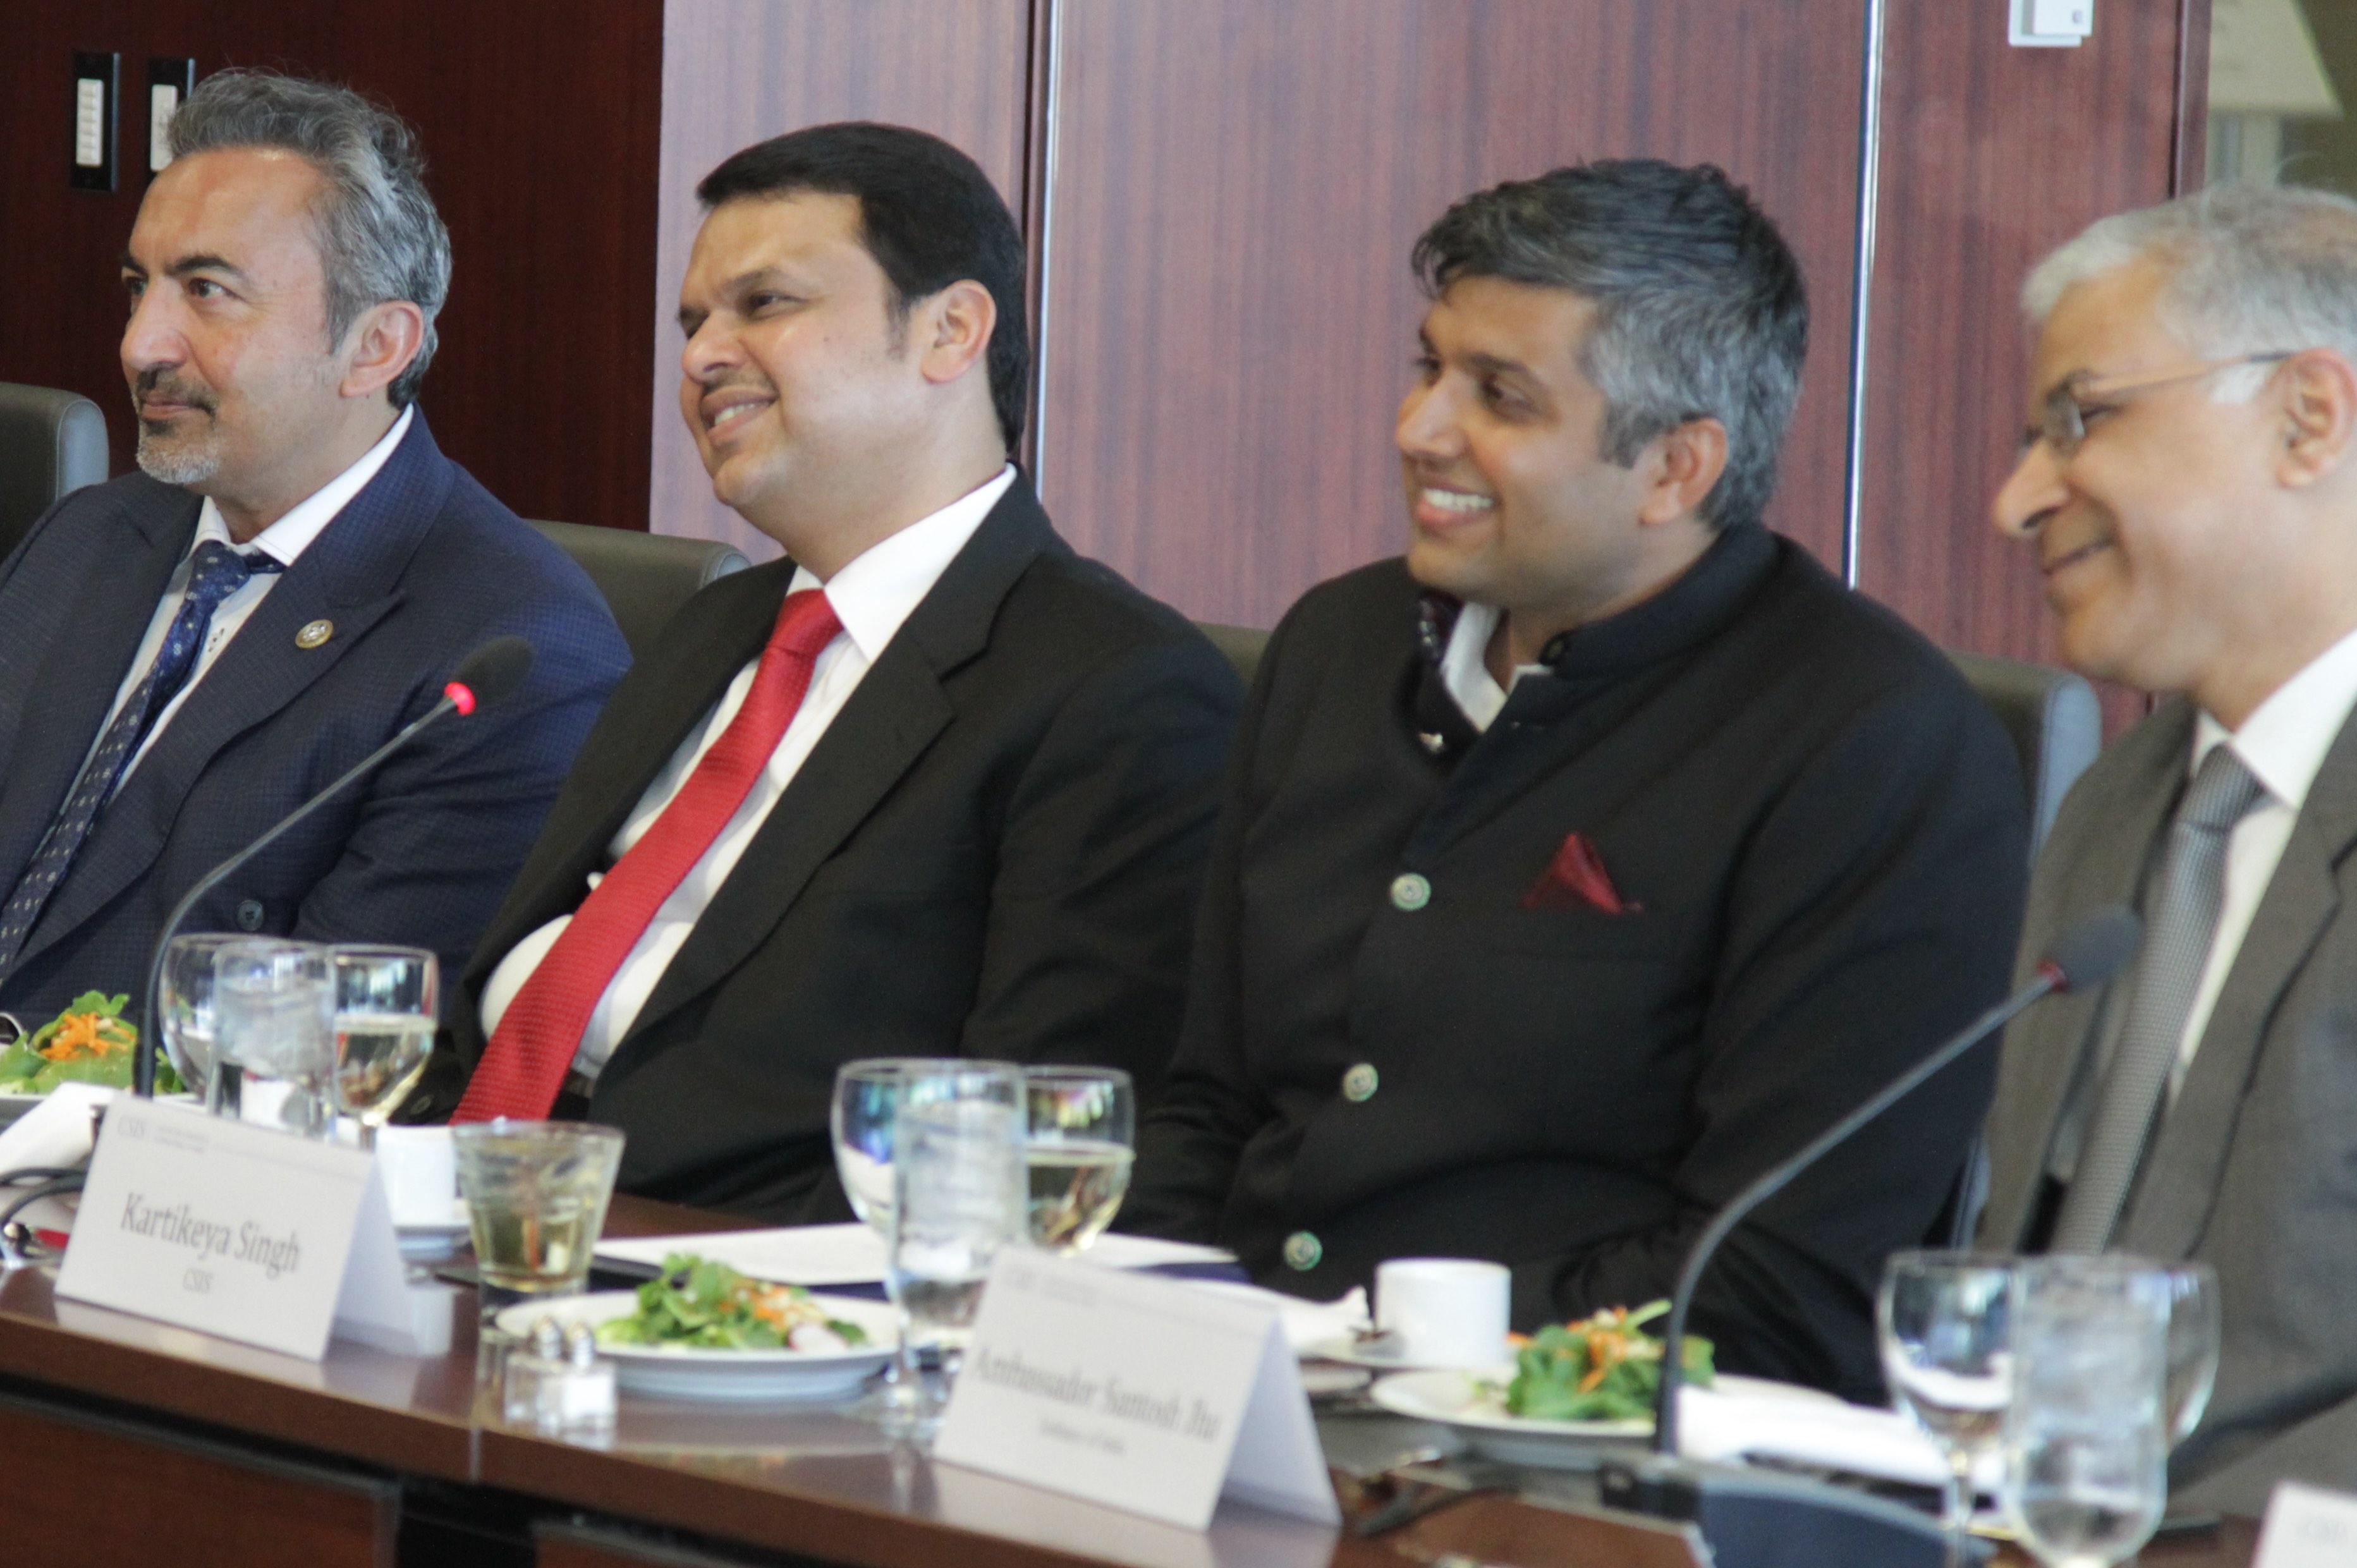 Maharastra CM with Bera, Karitkay CSIS, Jha of Embassy